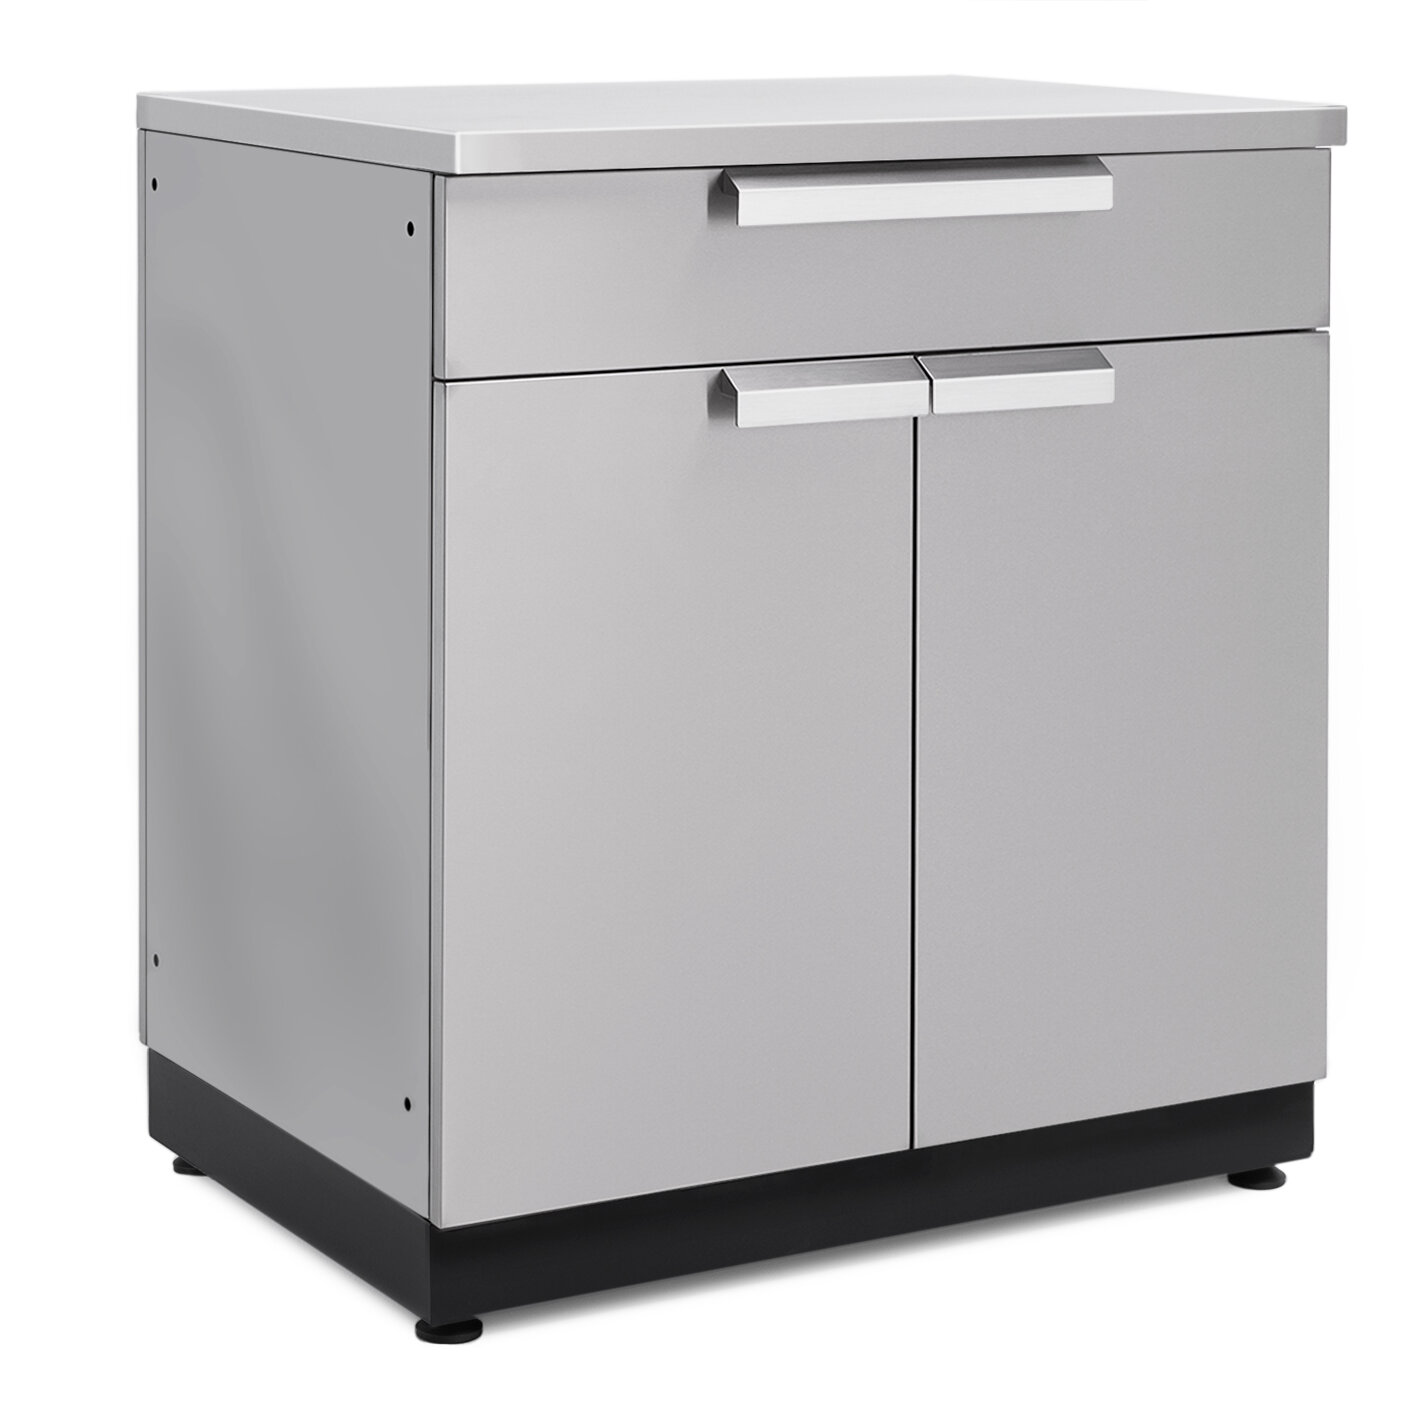 Newage Products Modular Outdoor Kitchen Cabinets Wayfair